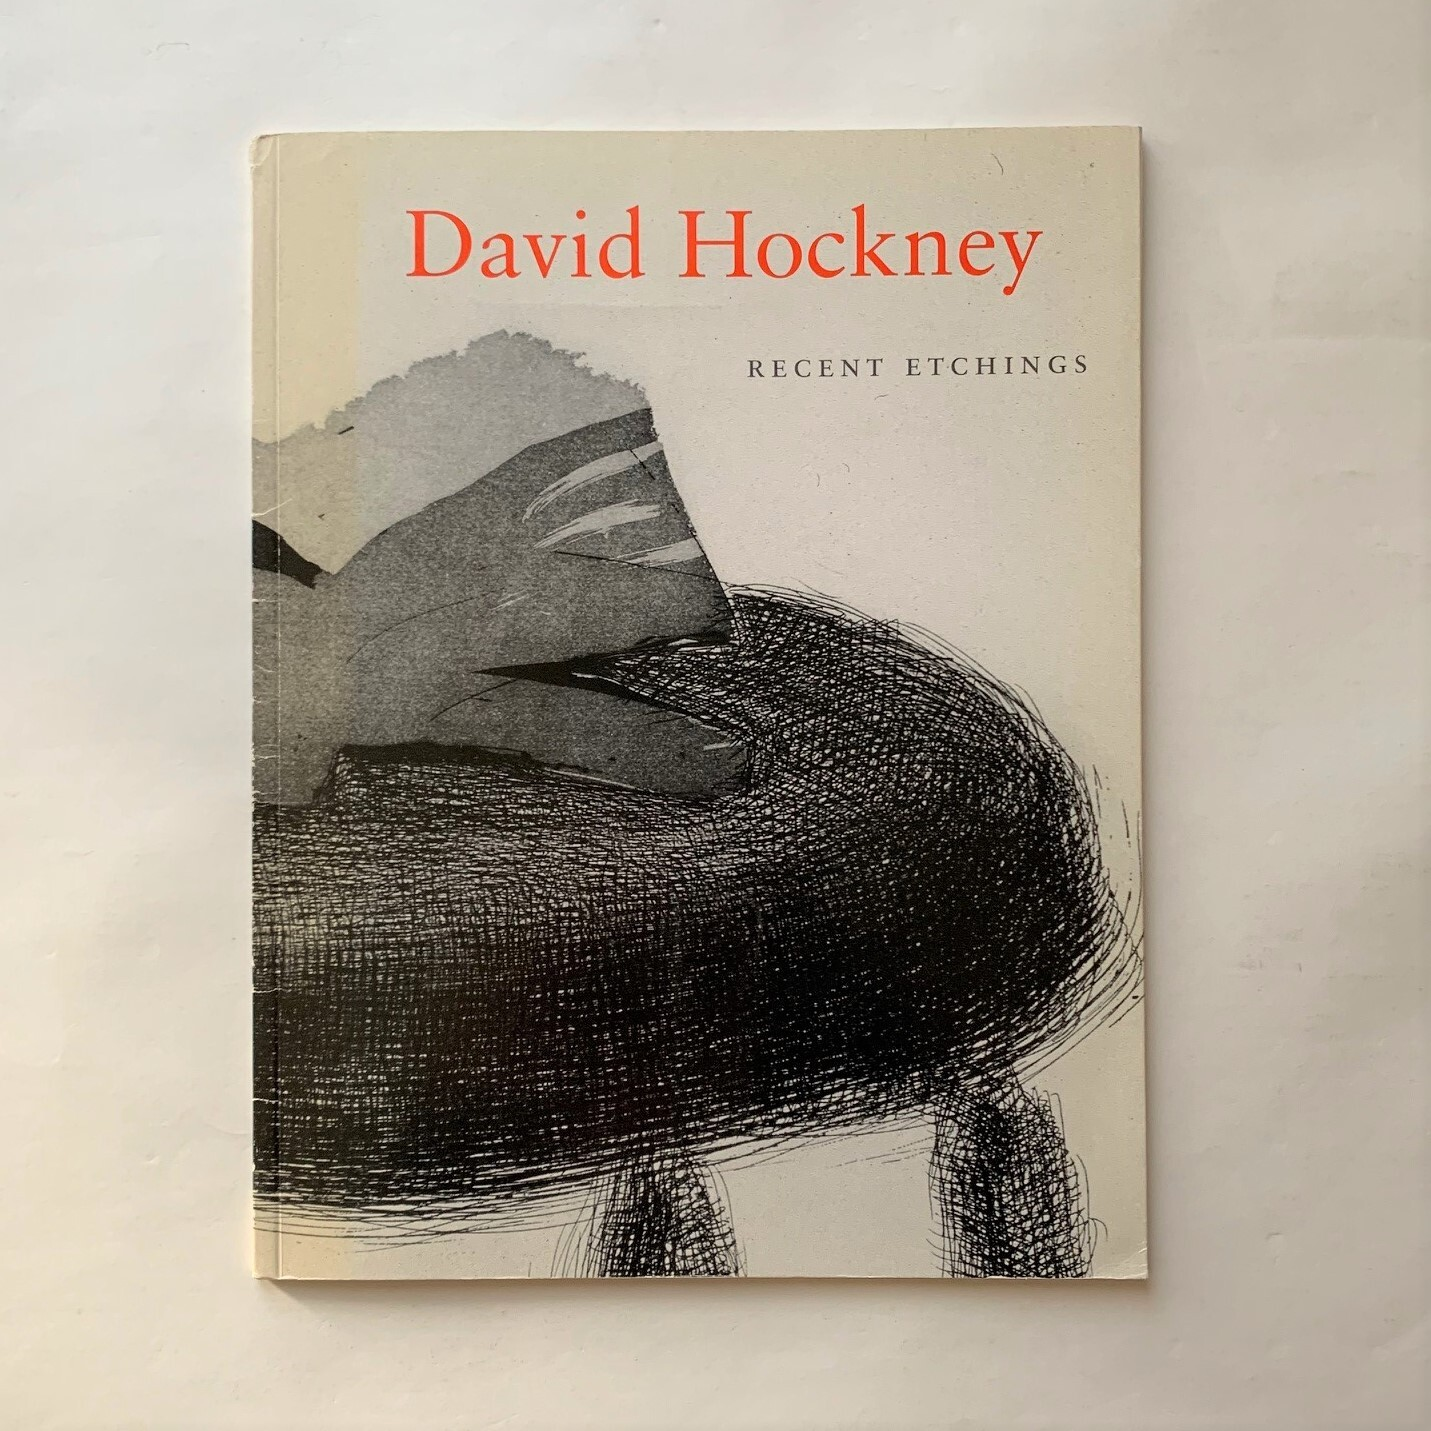 David Hockney: Recent Etchings / デイヴィッド・ホックニー